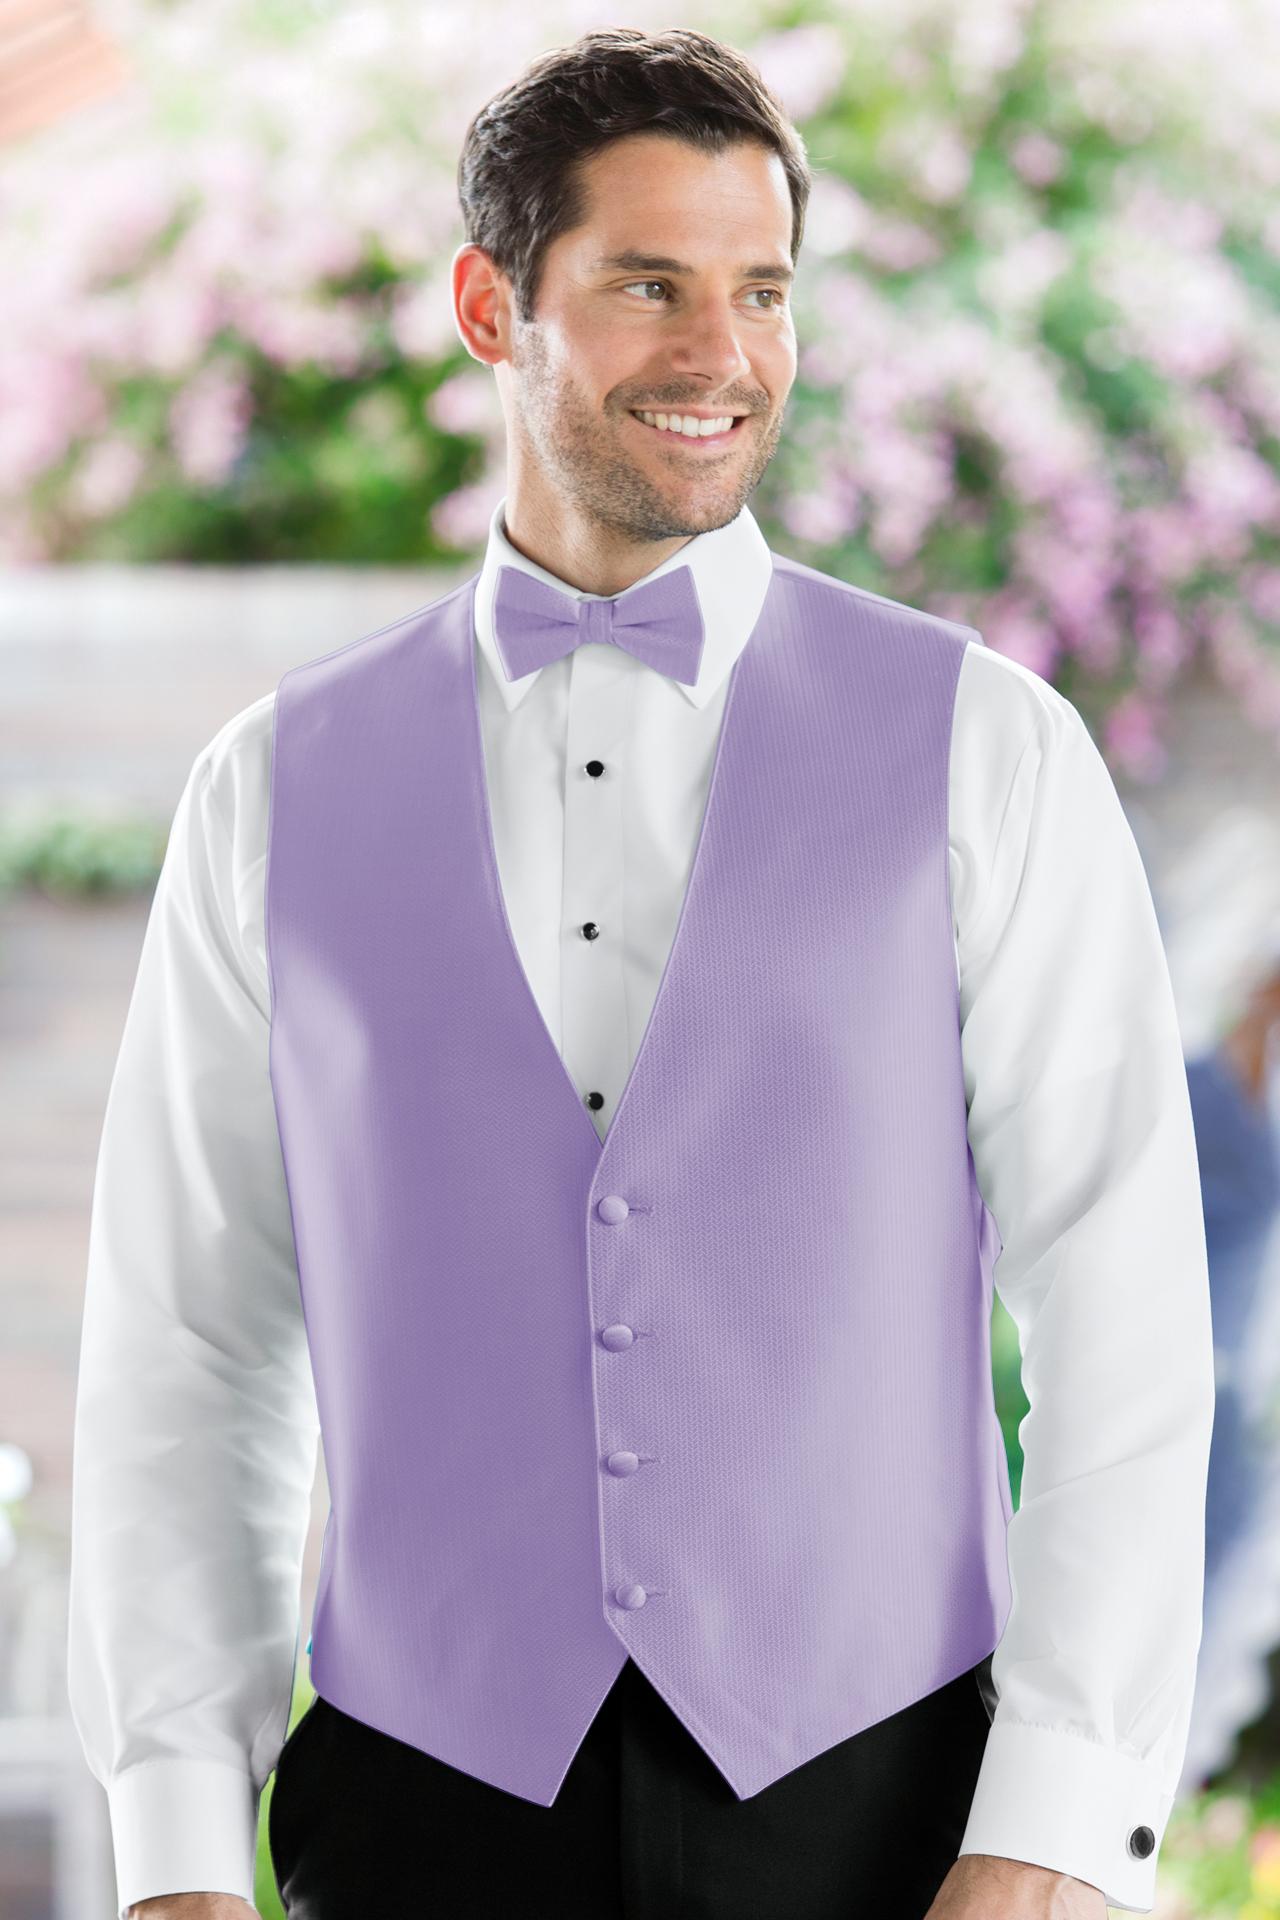 Herringbone Lavender Vest | Jim's Formal Wear